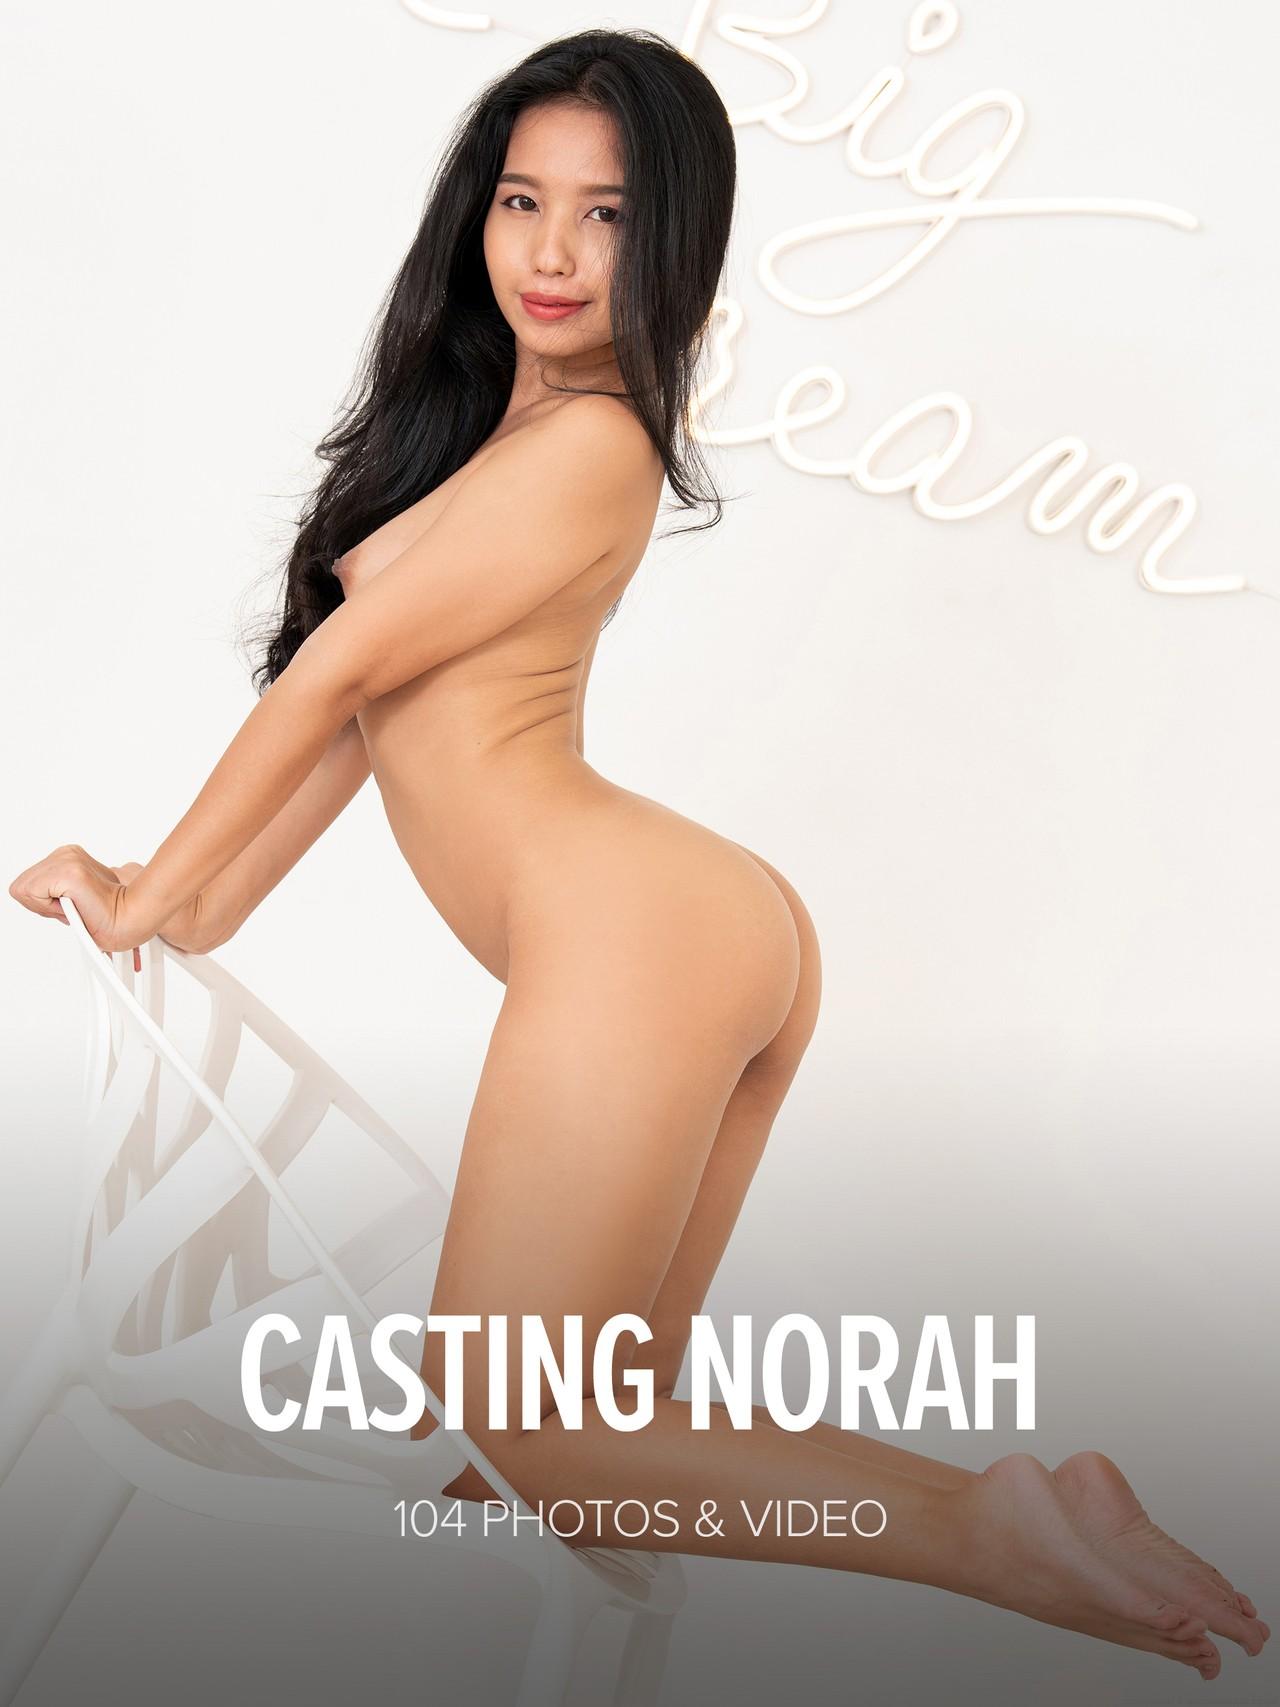 Norah: CASTING Norah